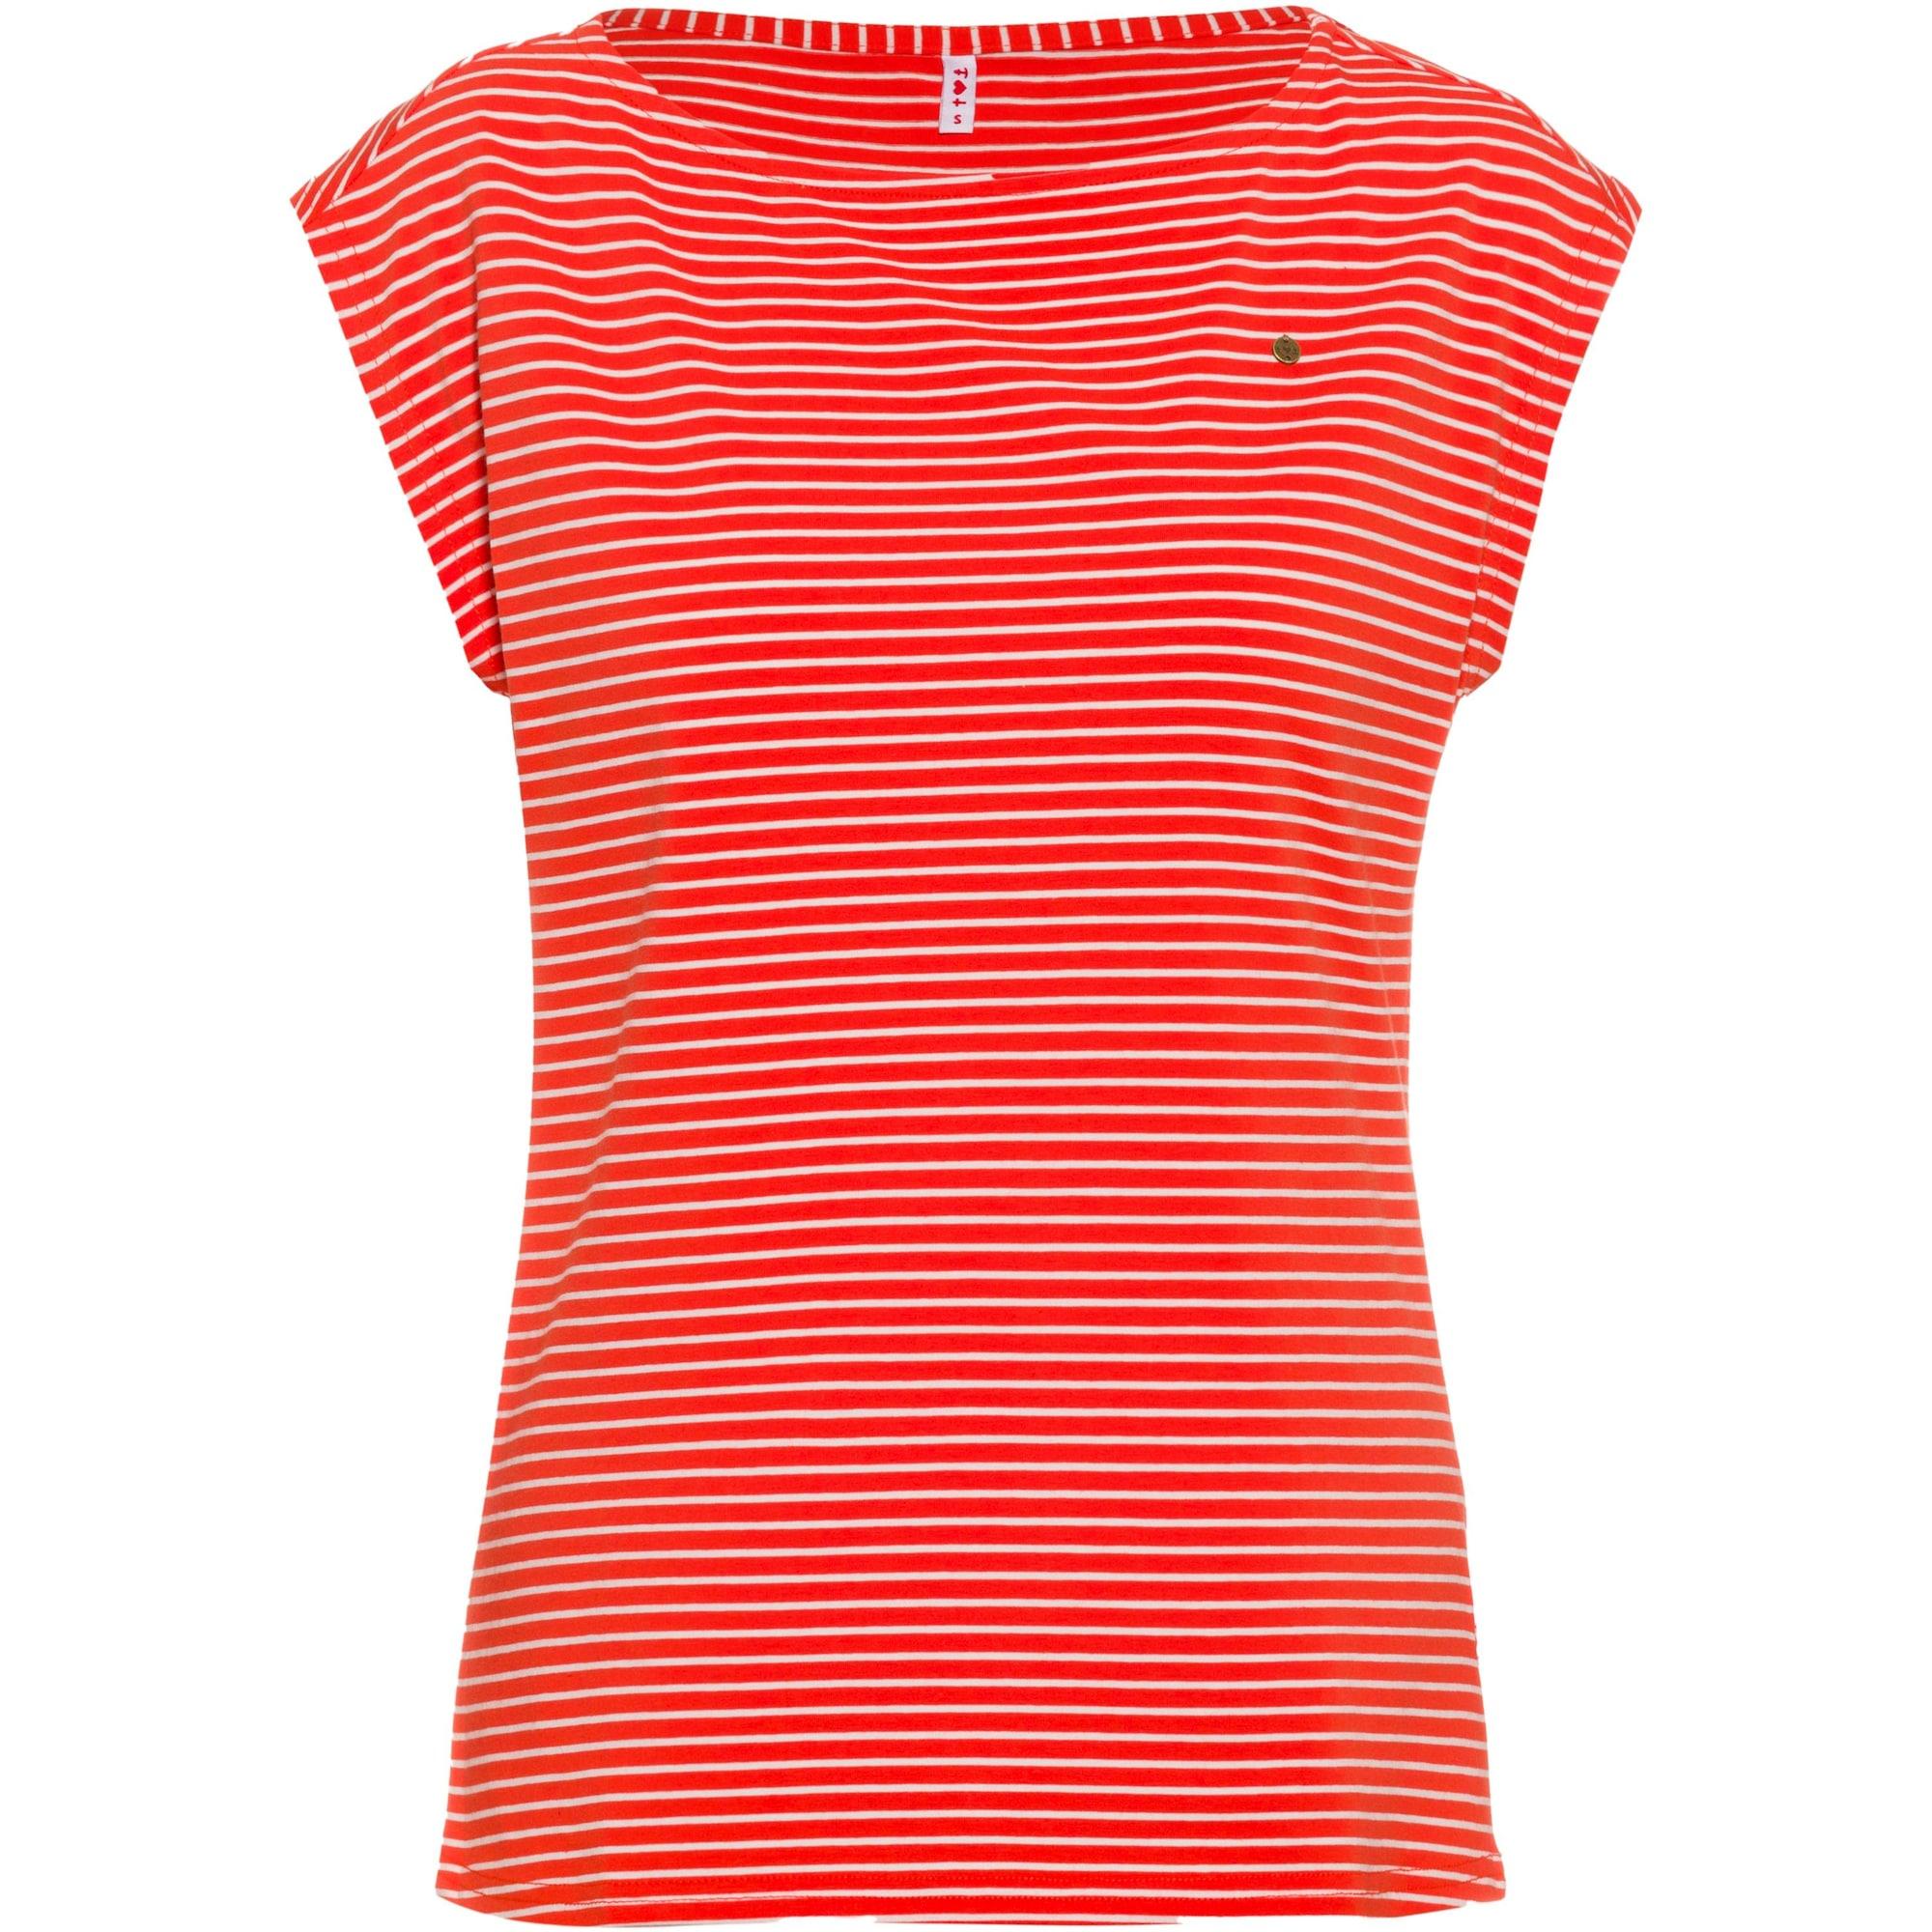 Blutsgeschwister Marškinėliai raudona / balta